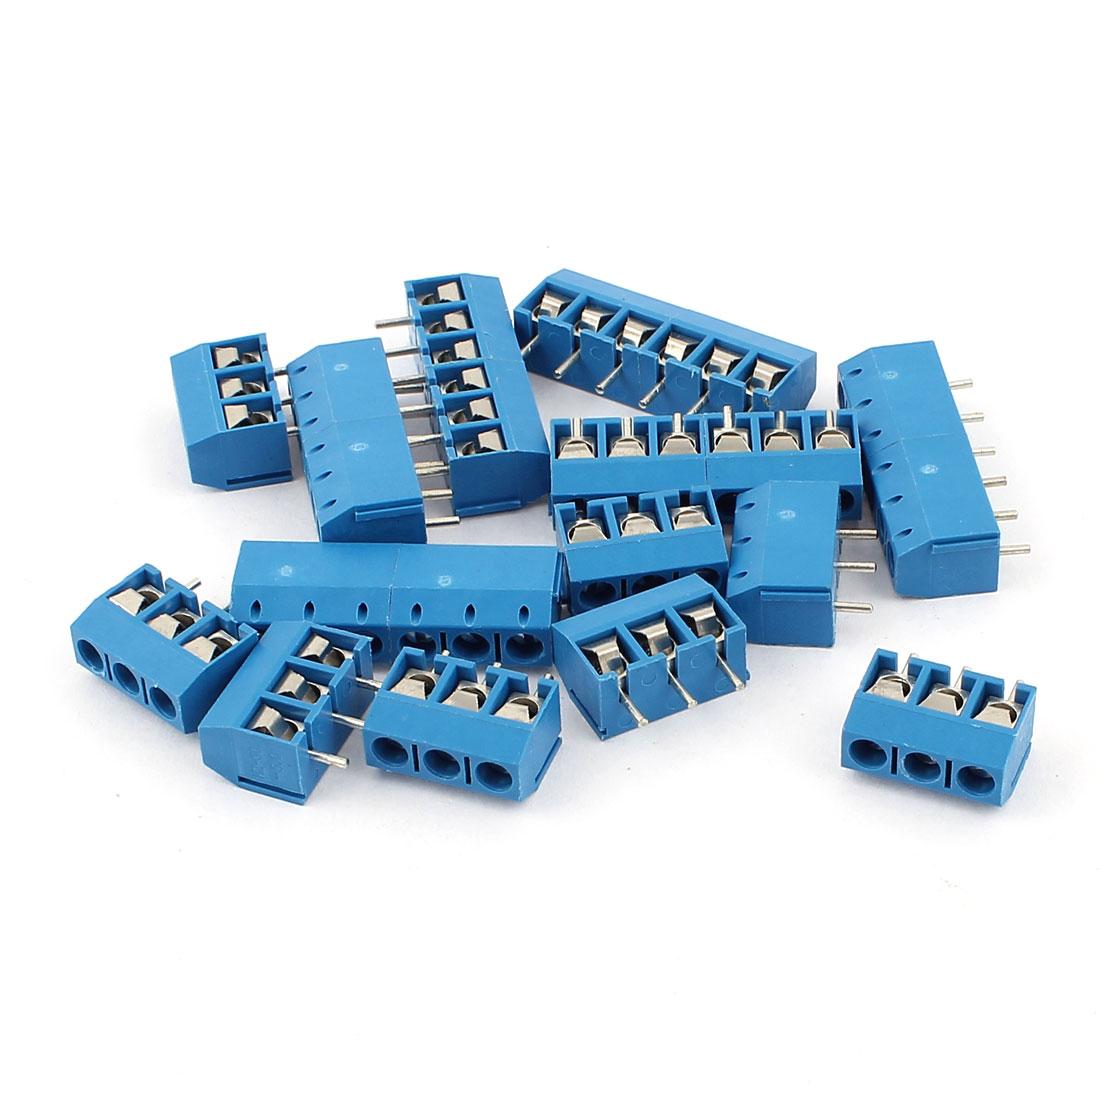 10 Pcs AC 300V 10A 6 Pins PCB Terminal Block Connector 5.0mm Pitch Blue